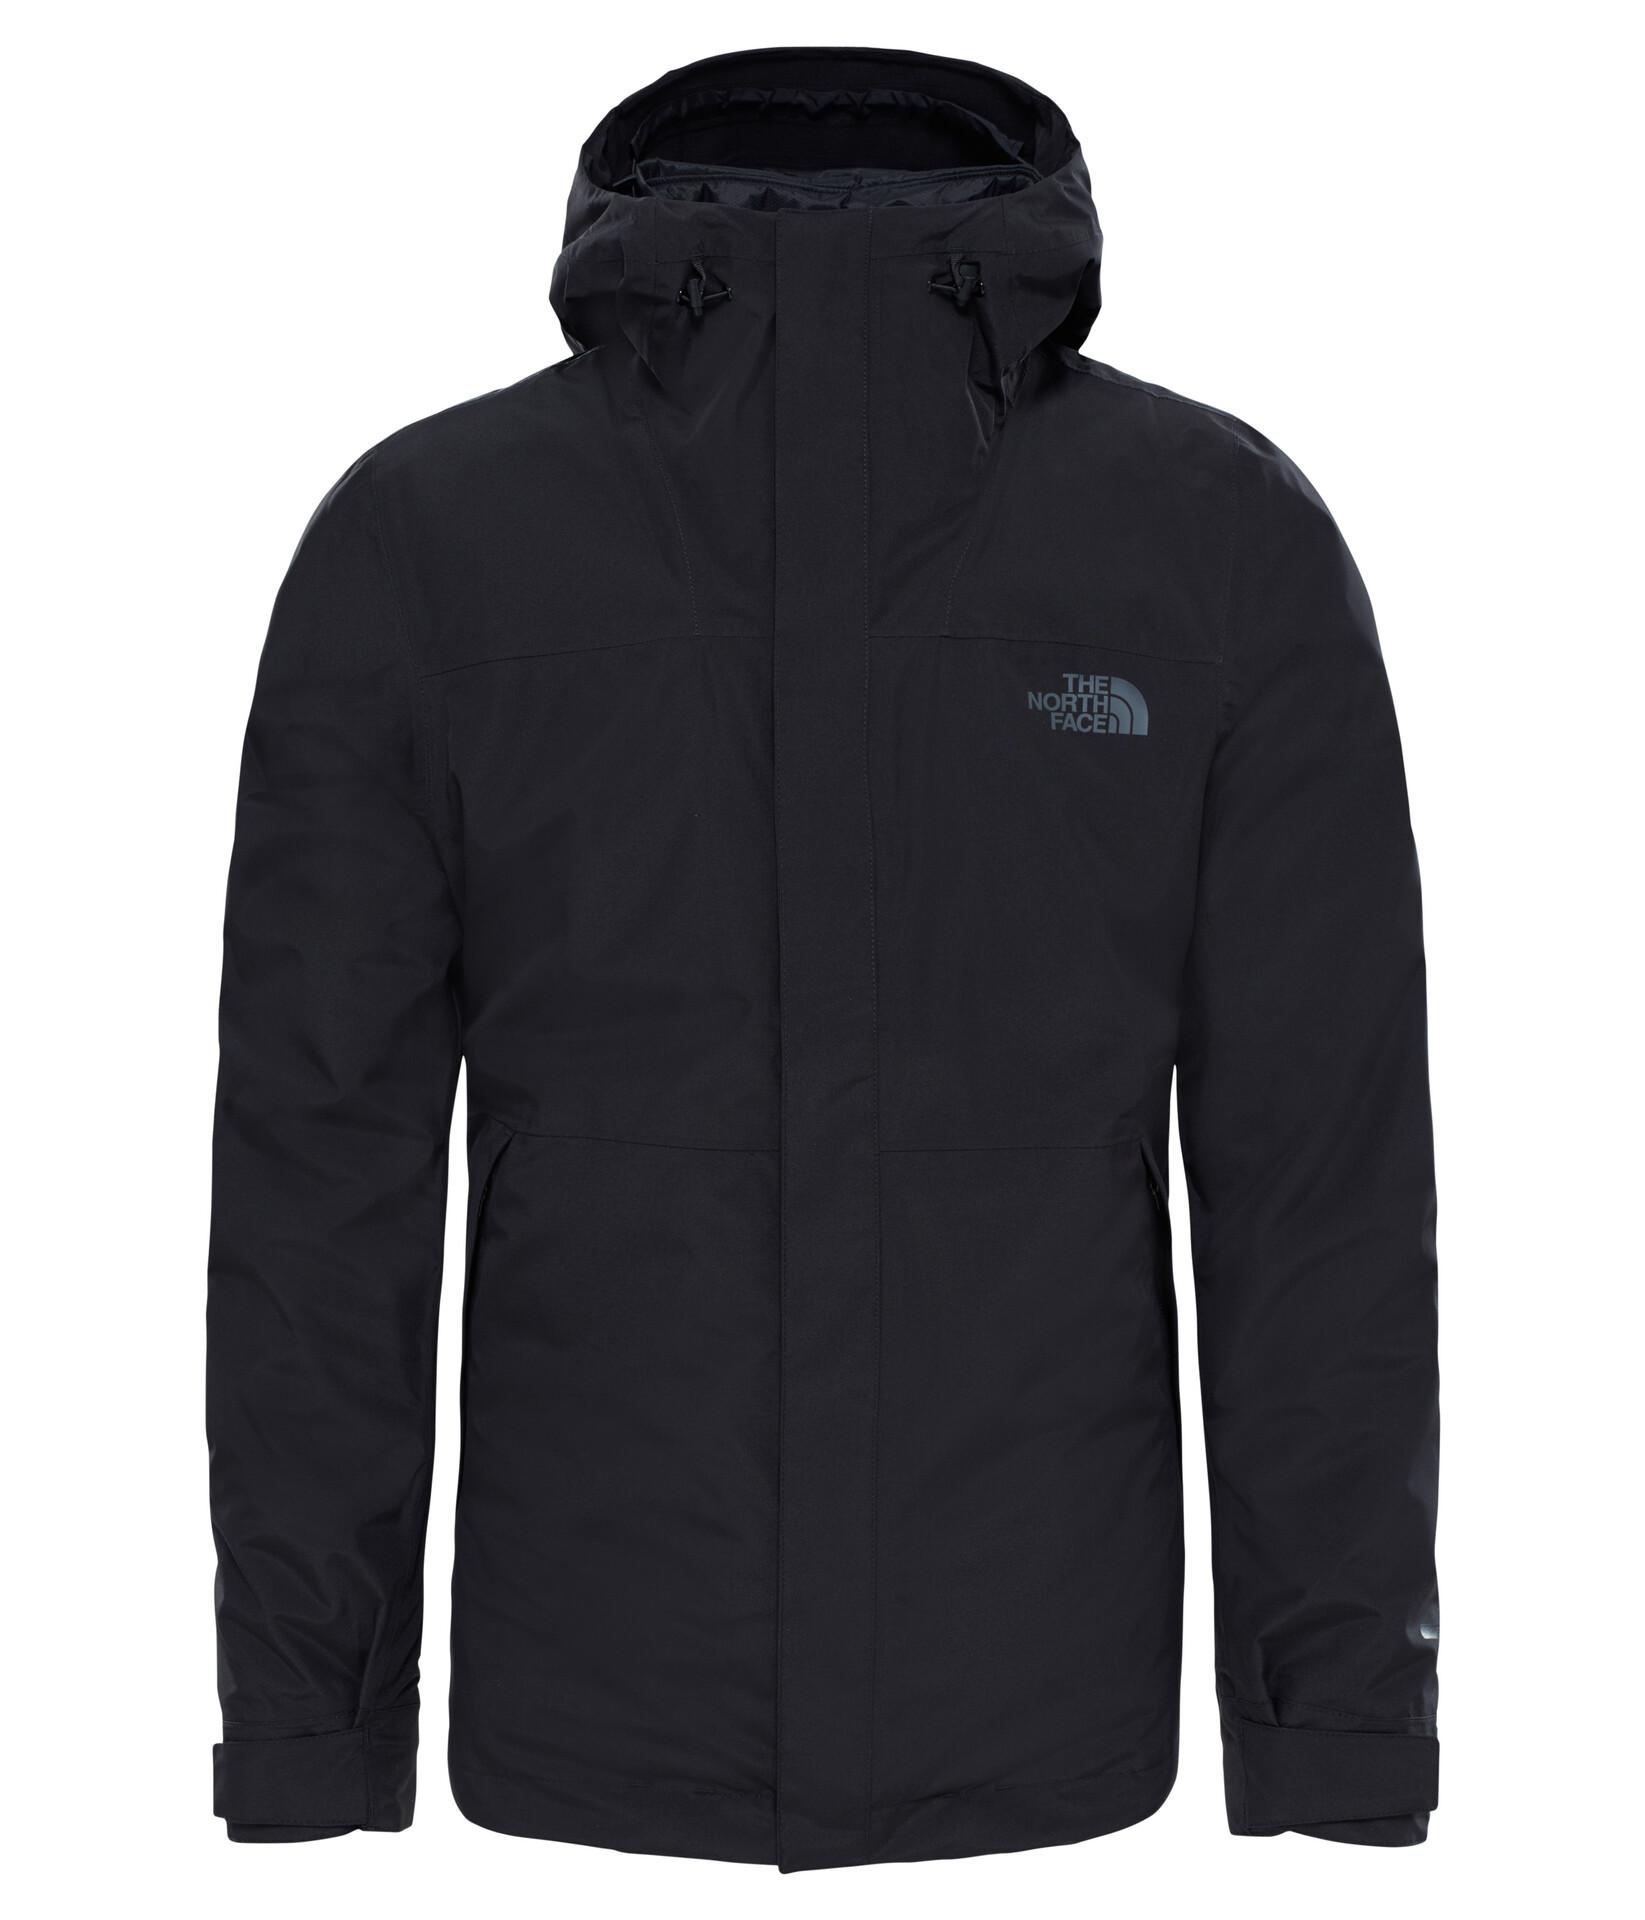 57e5858e5 discount the north face mens denali fleece jacket brown urine ac5d2 ...